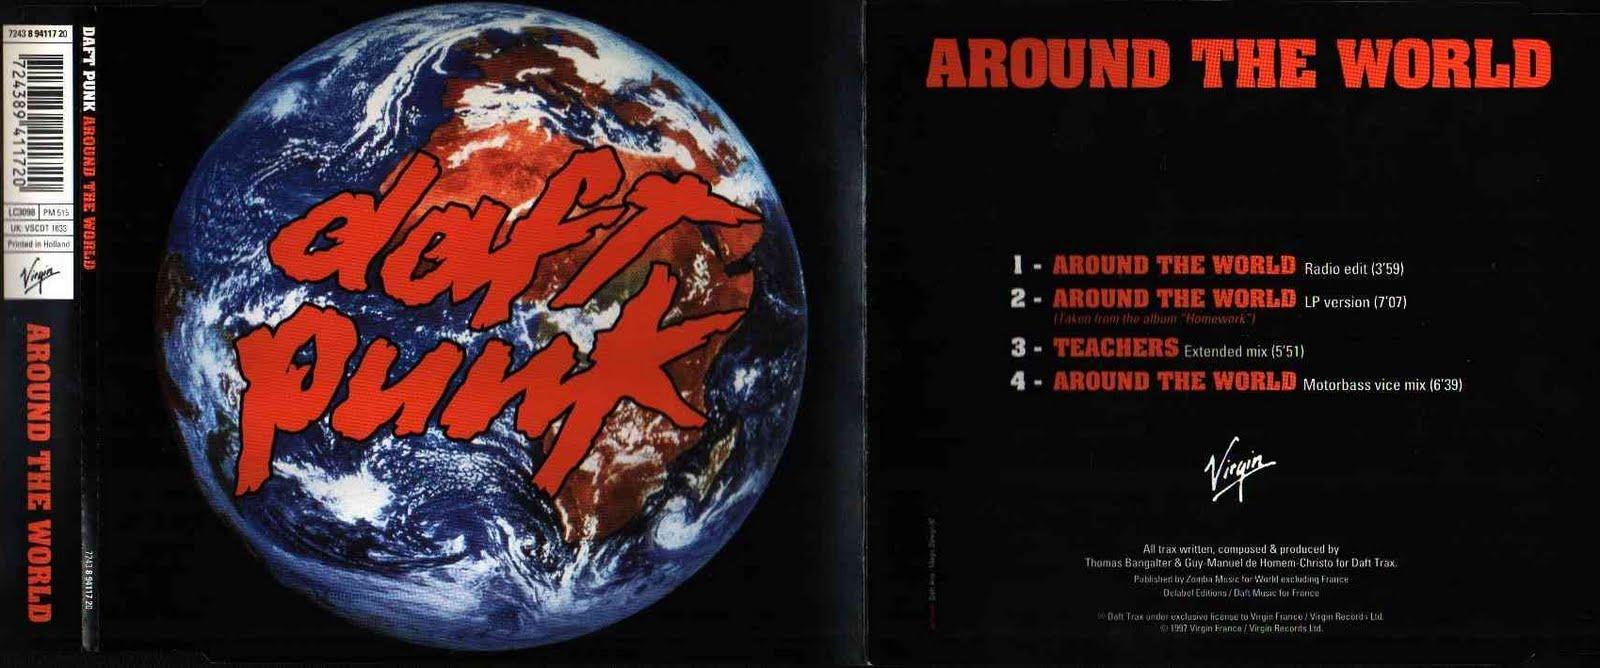 daft punk 1997 - Around The World (CD Single)   FULL LP ...